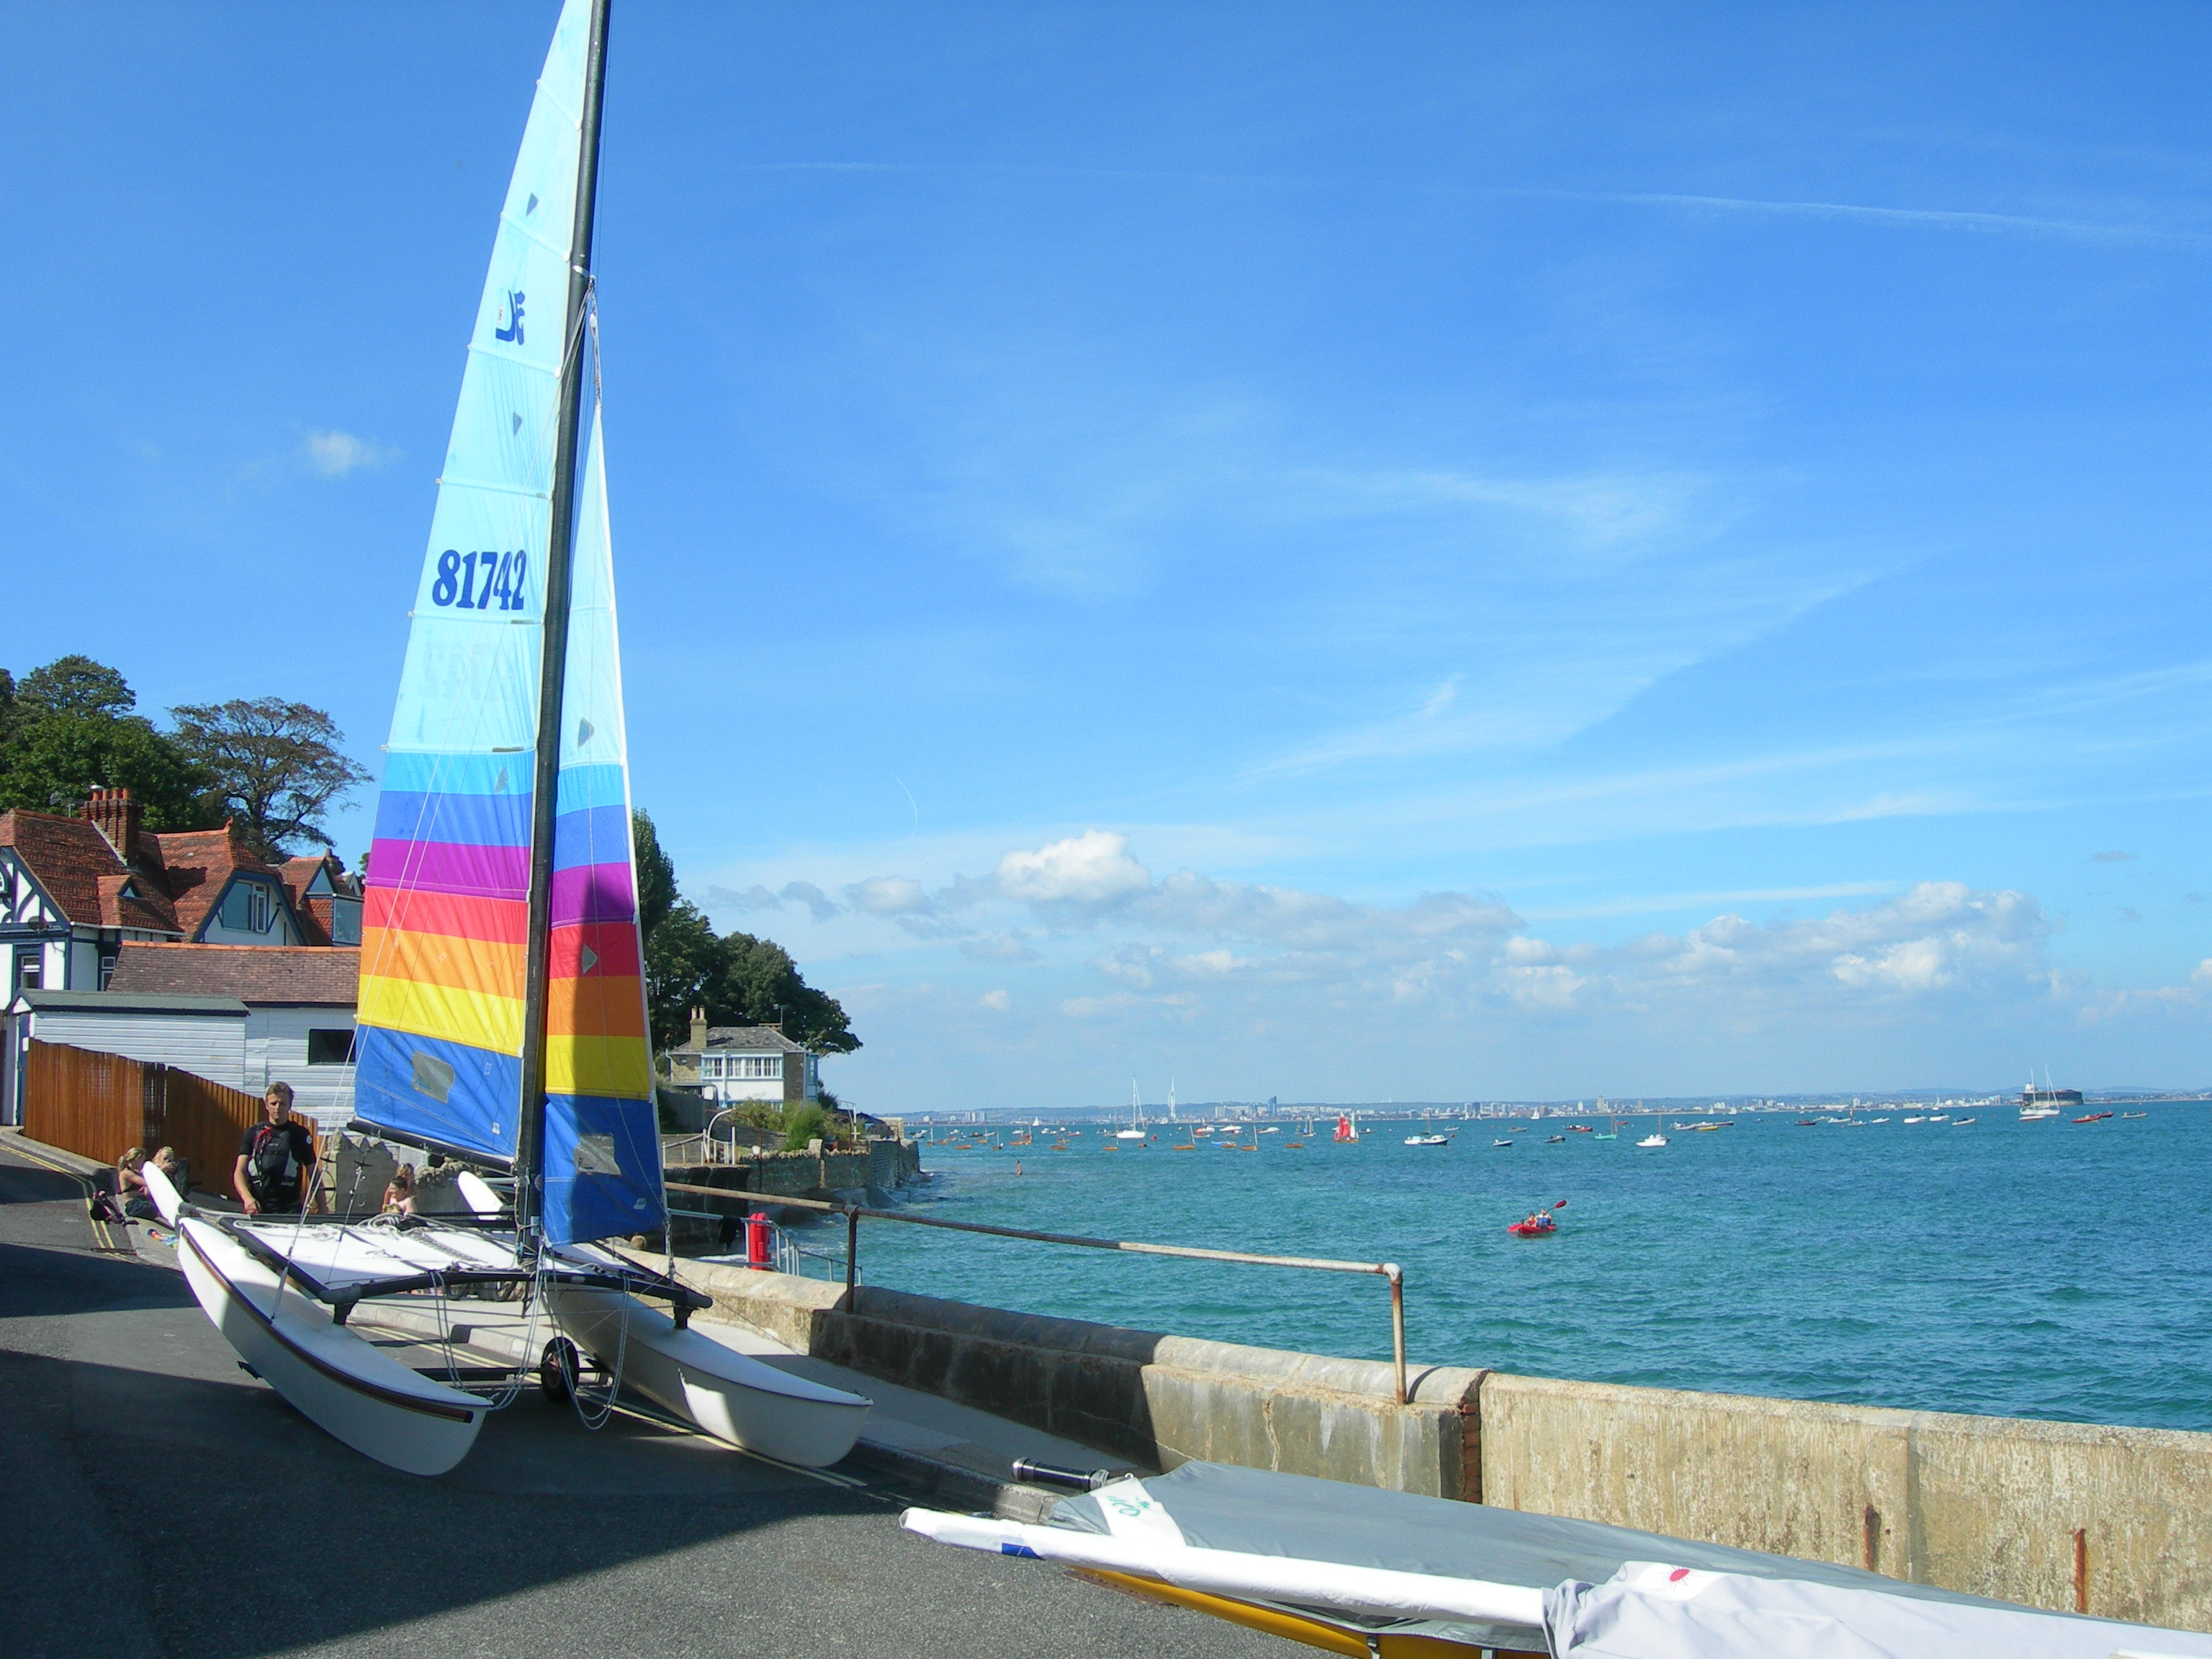 Sailing at Seaview